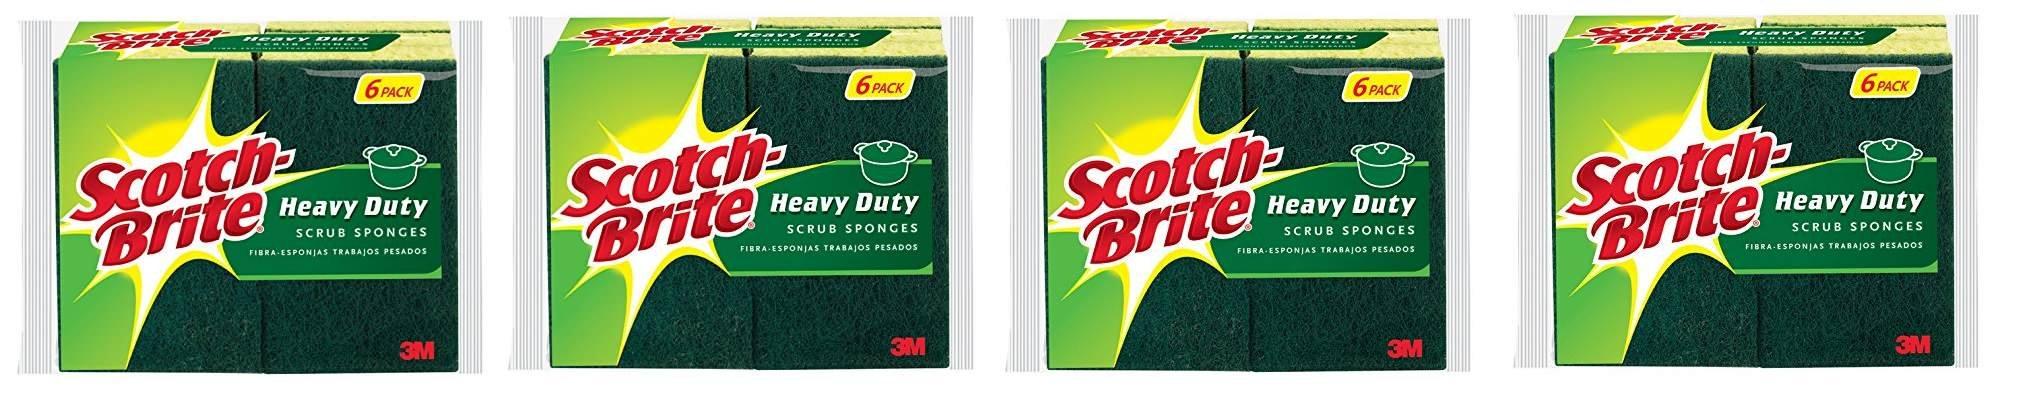 Scotch-Brite Heavy Duty Scrub Sponge xworqU, 24 Count by Scotch-Brite